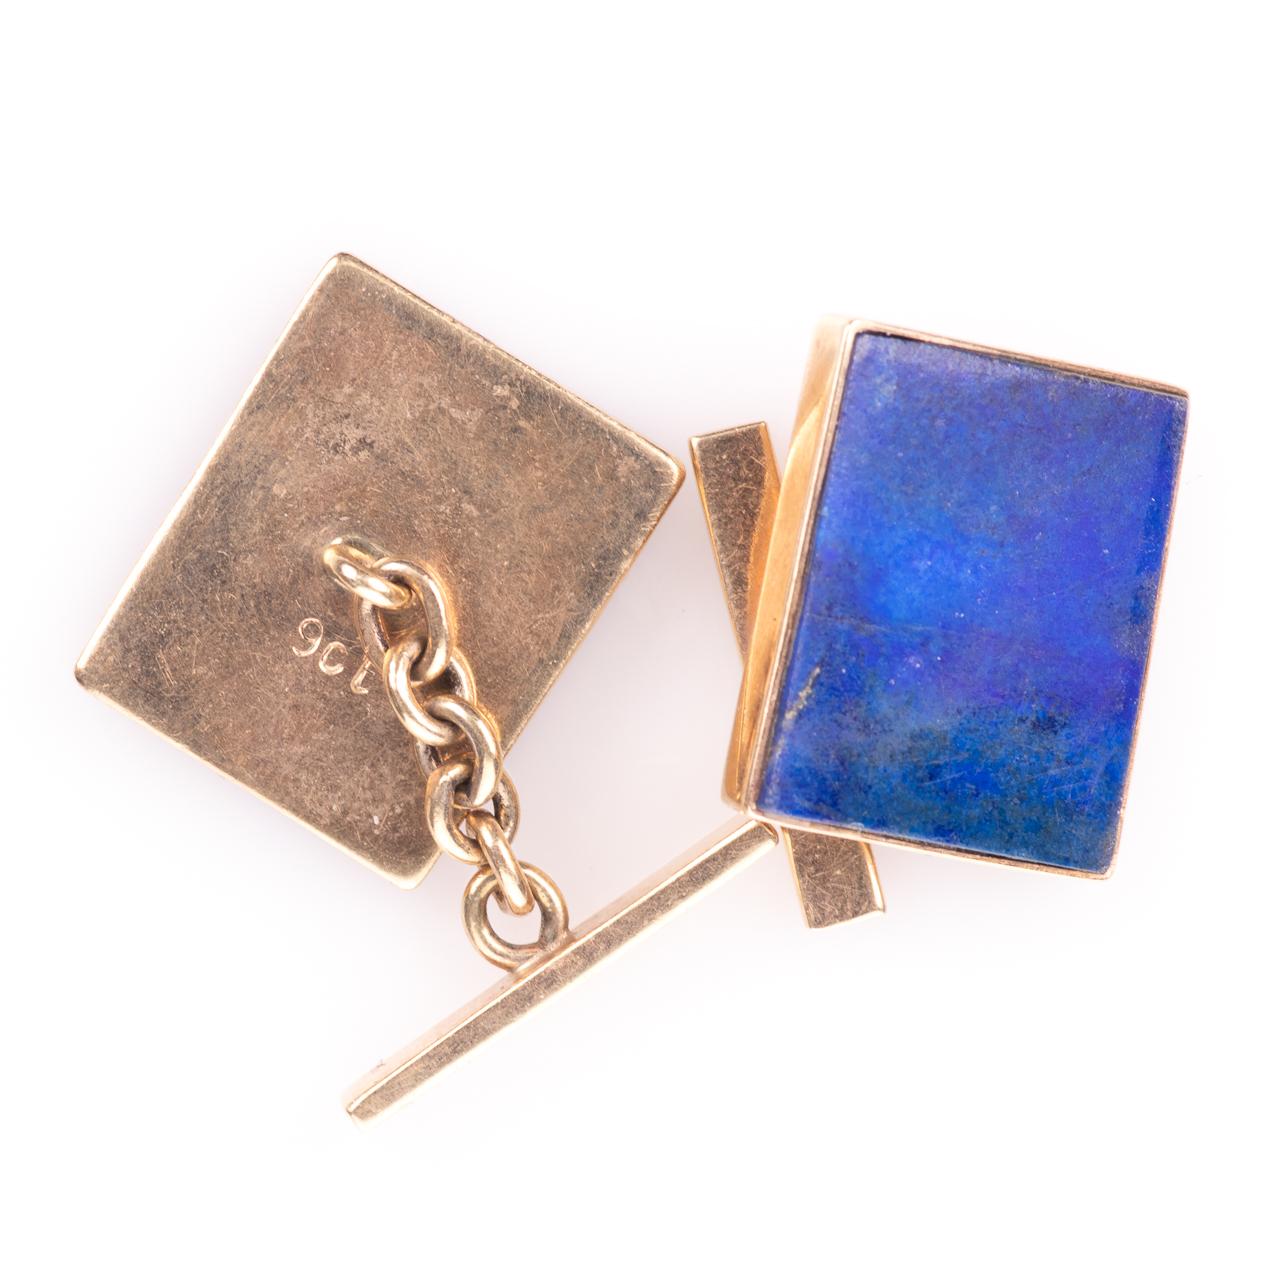 9ct Gold Gentleman's Lapis Lazuli Cufflinks - Image 3 of 5